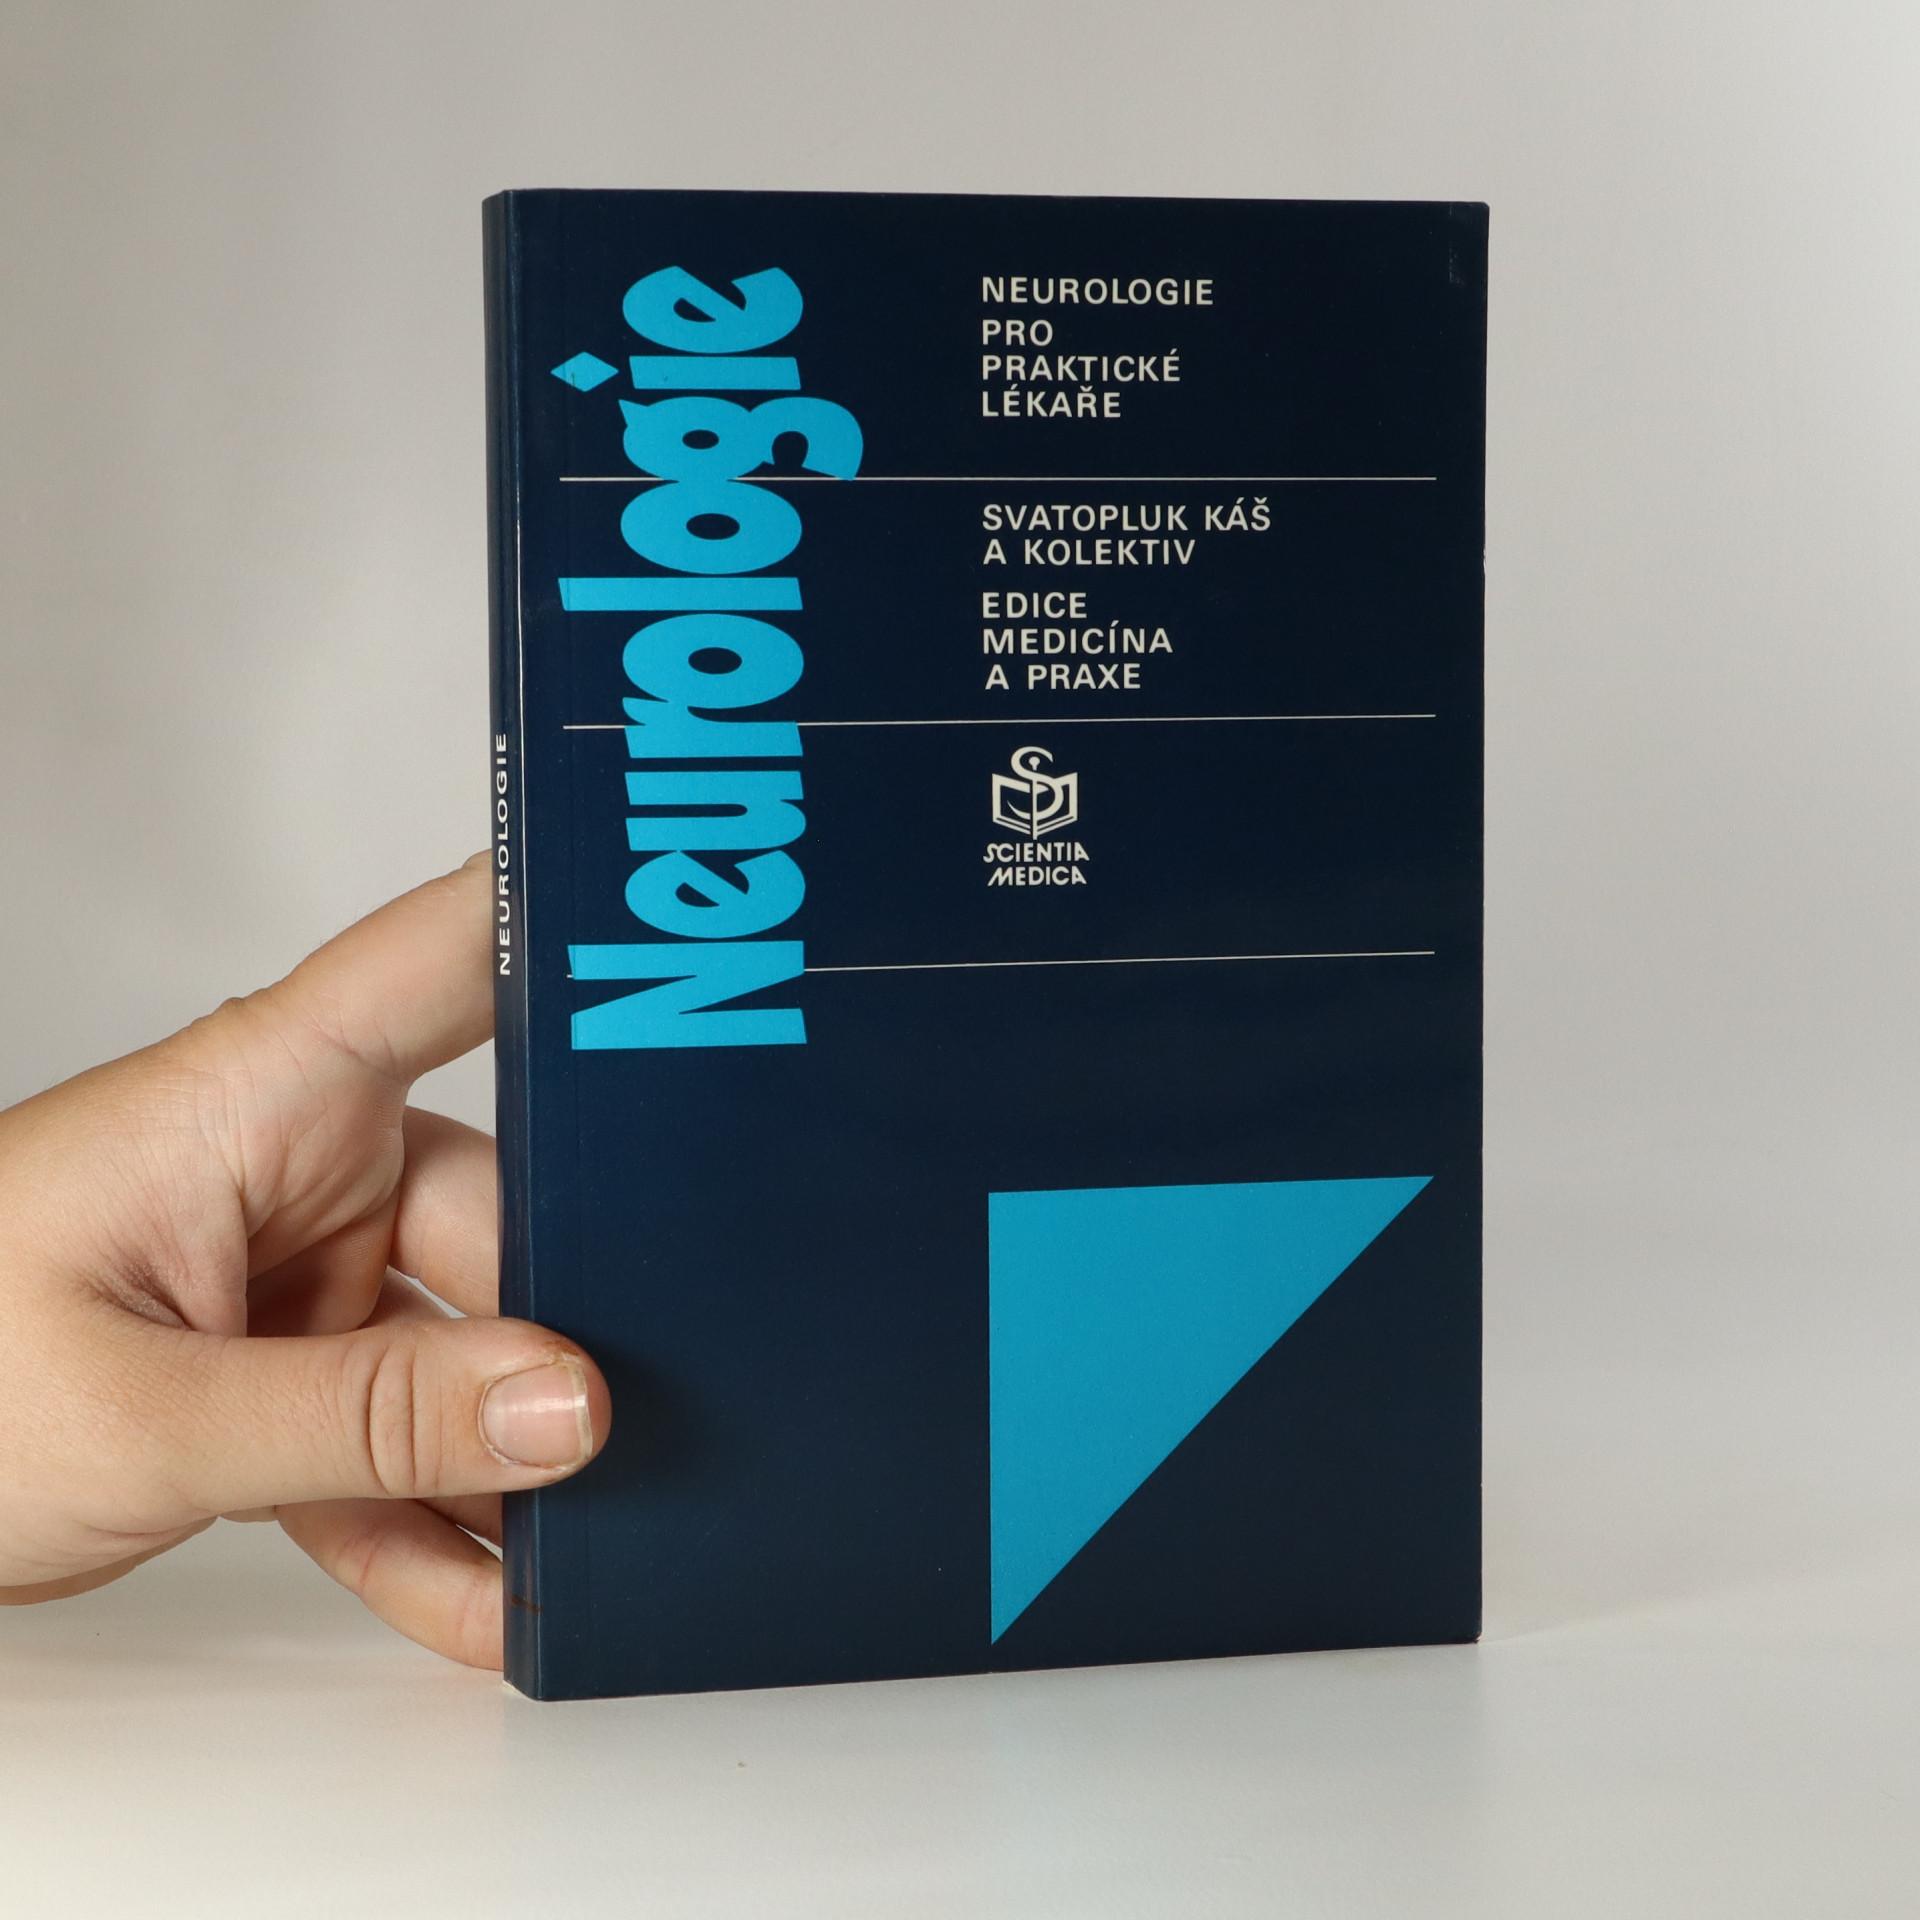 antikvární kniha Neurologie. Neurologie pro praktické lékaře, 1993